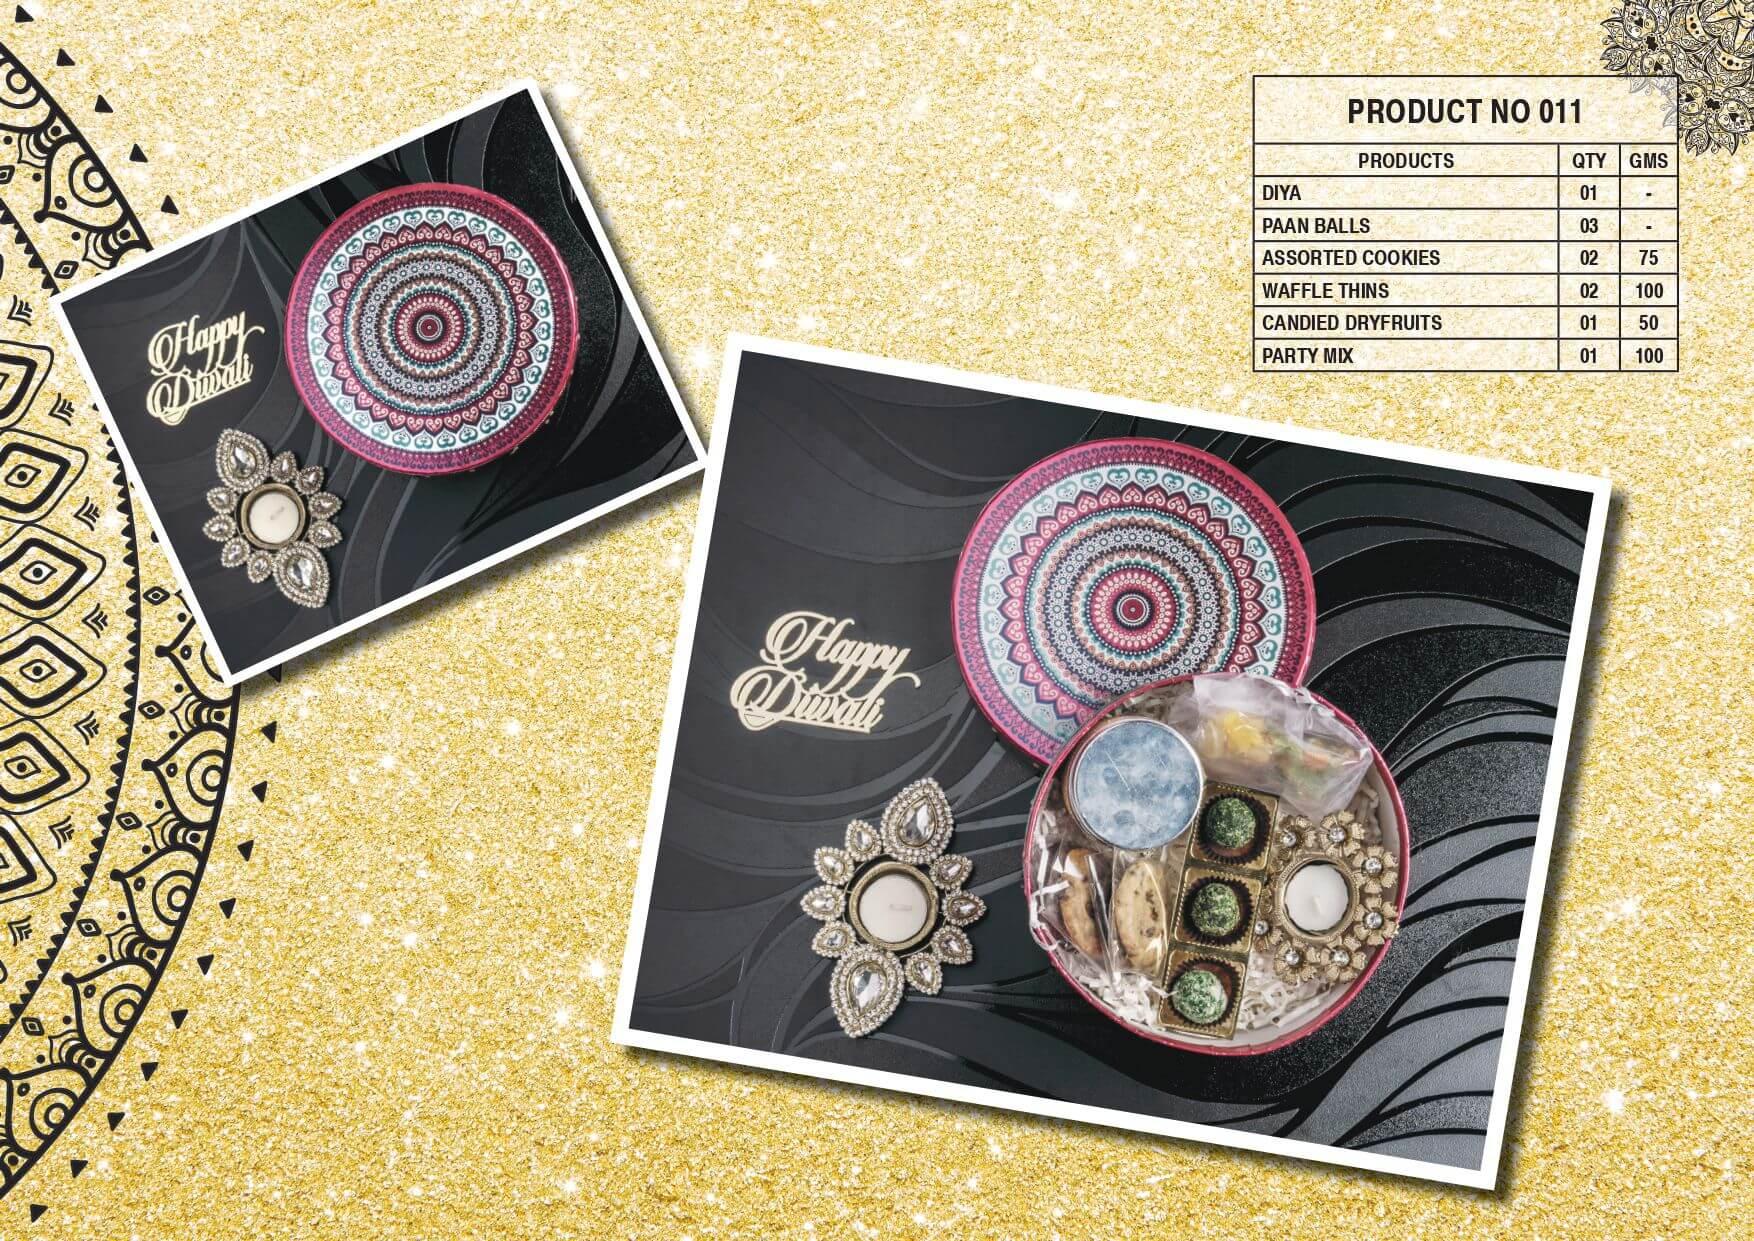 Diwali Gift Ideas Handmade PRODUCT NO 011